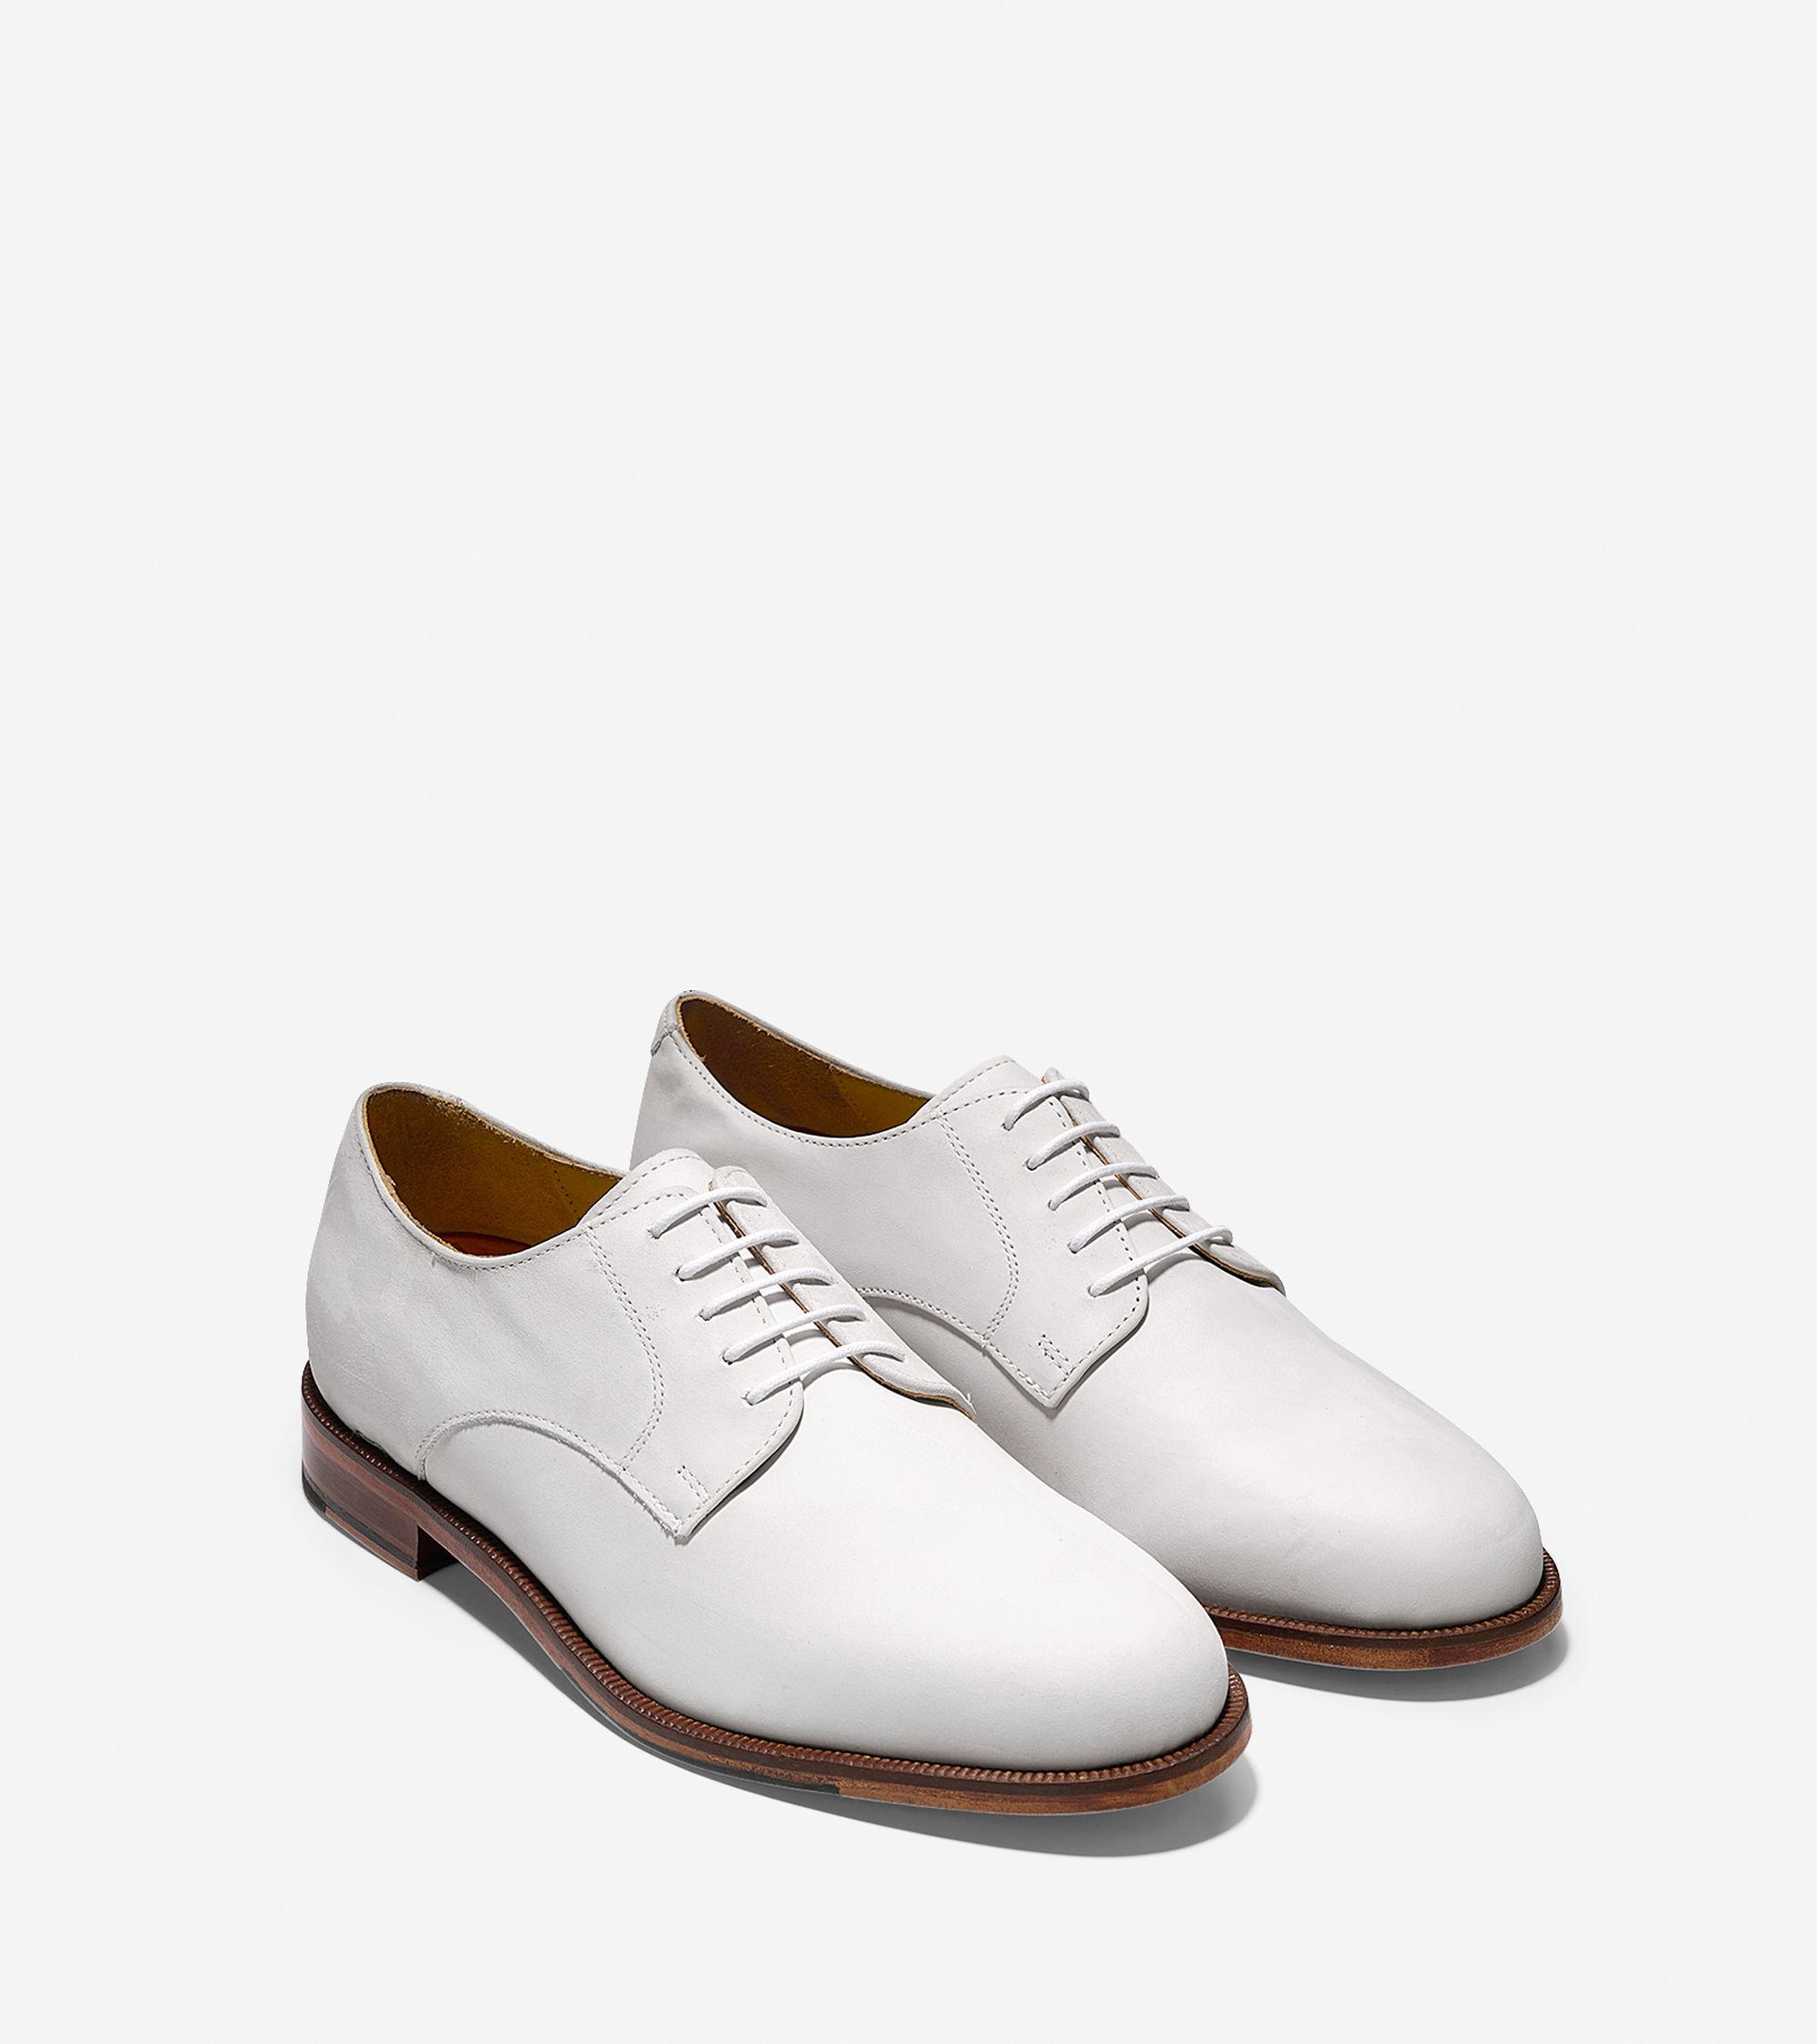 White Nubuck Oxford Shoes